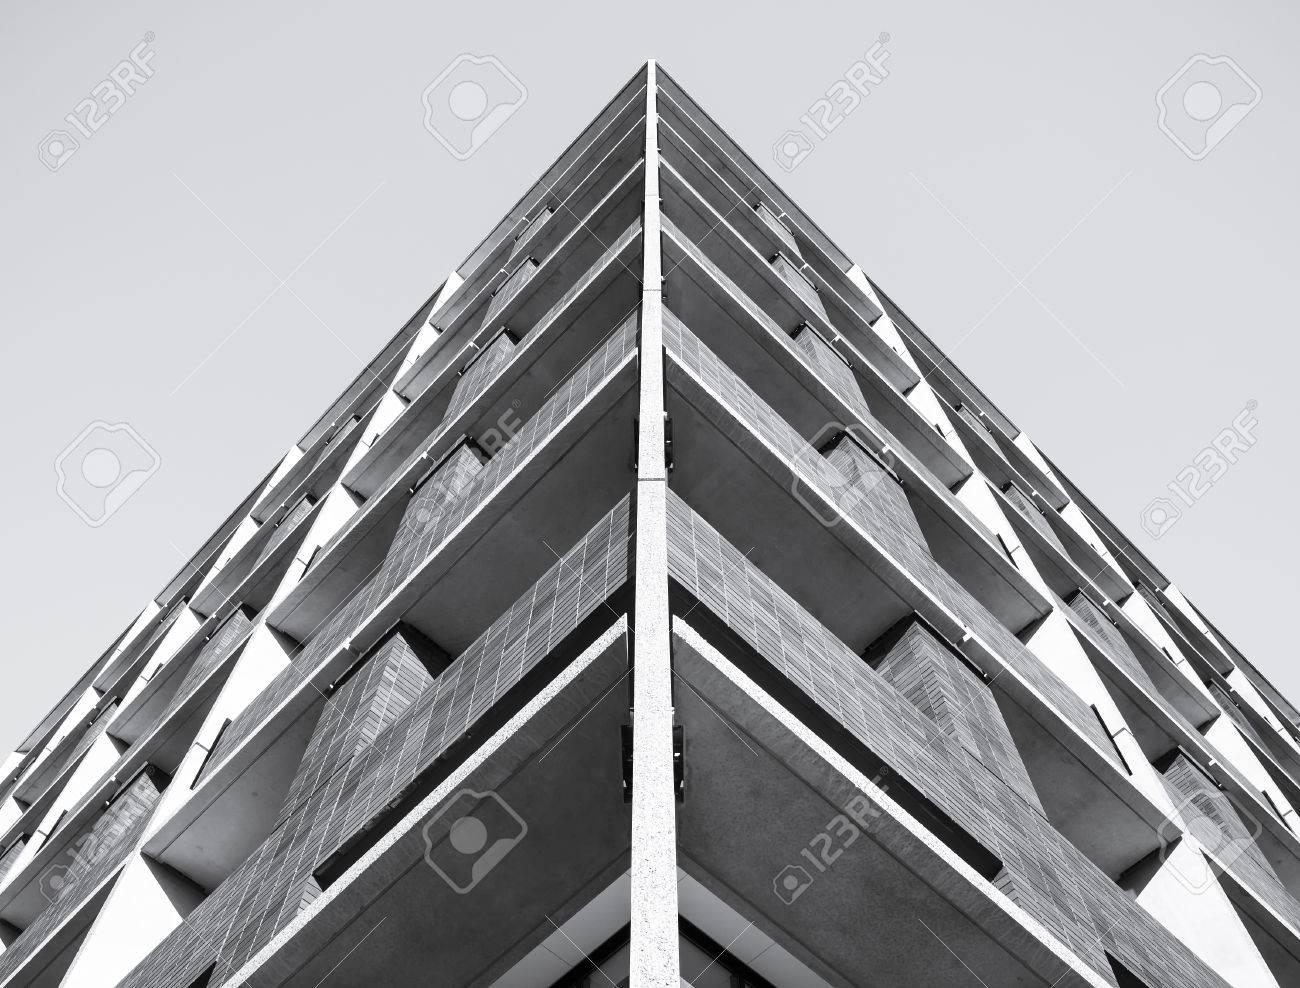 Architecture detail Modern Building Pattern Background - 54066952